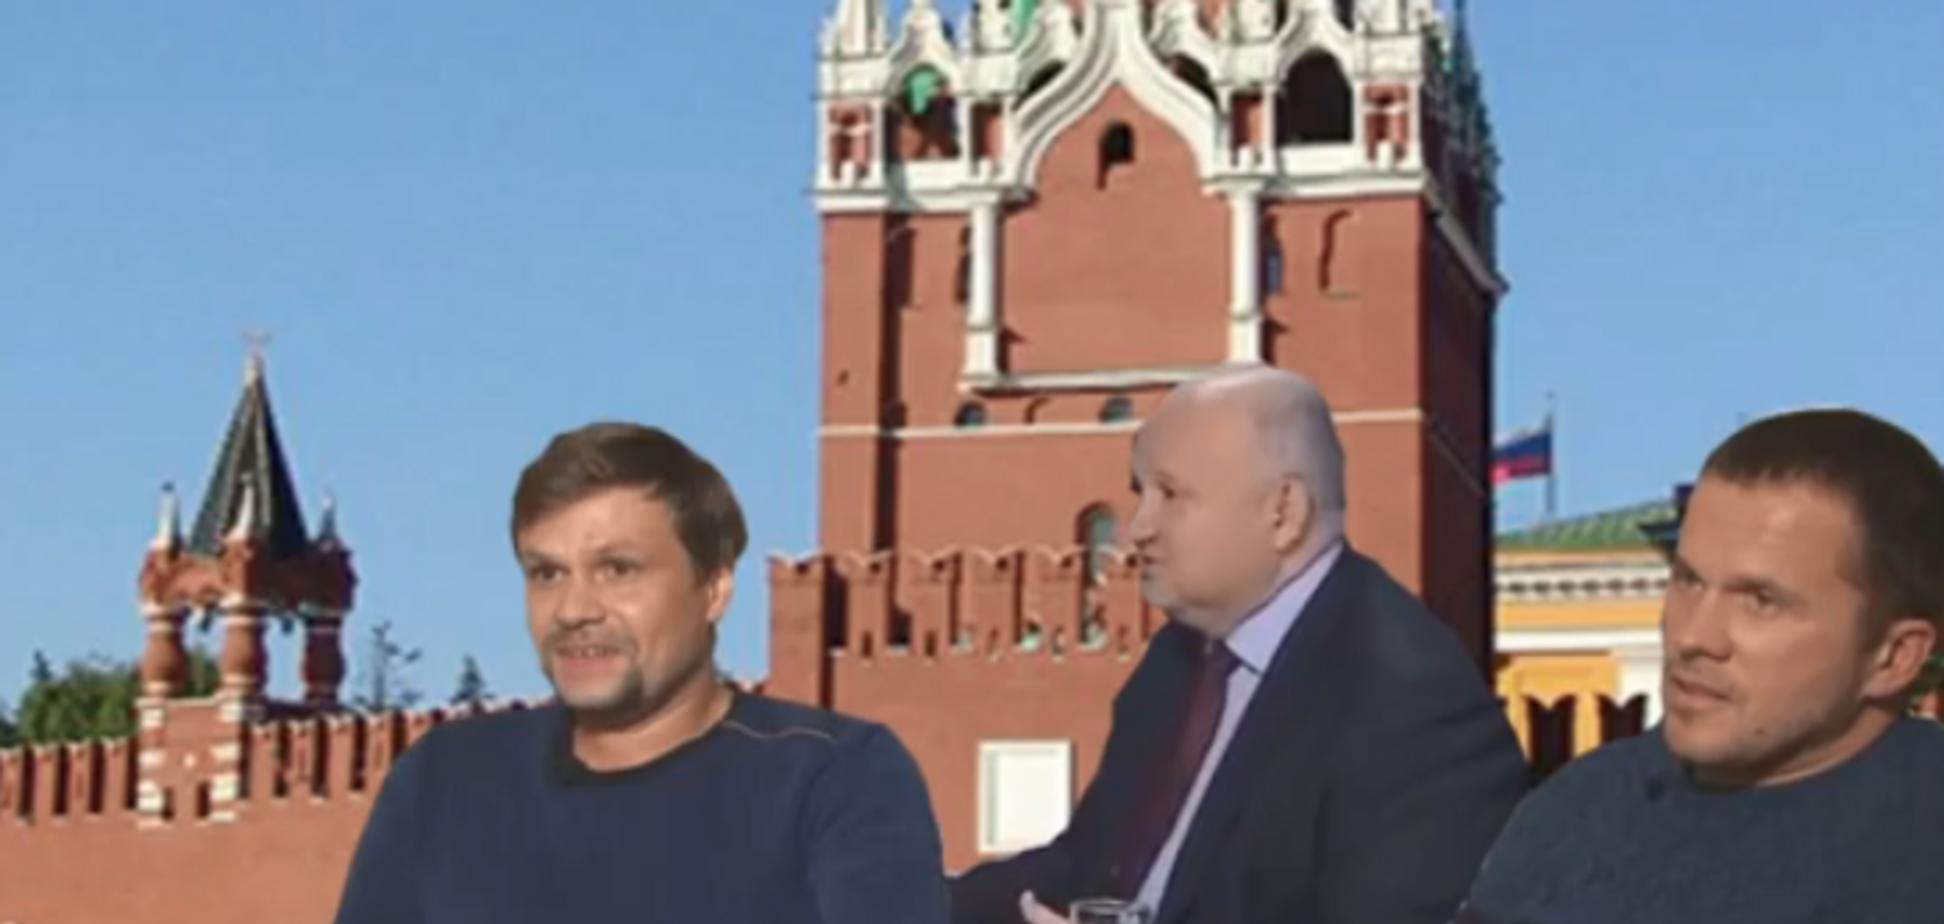 Смешко, Петров и Боширов